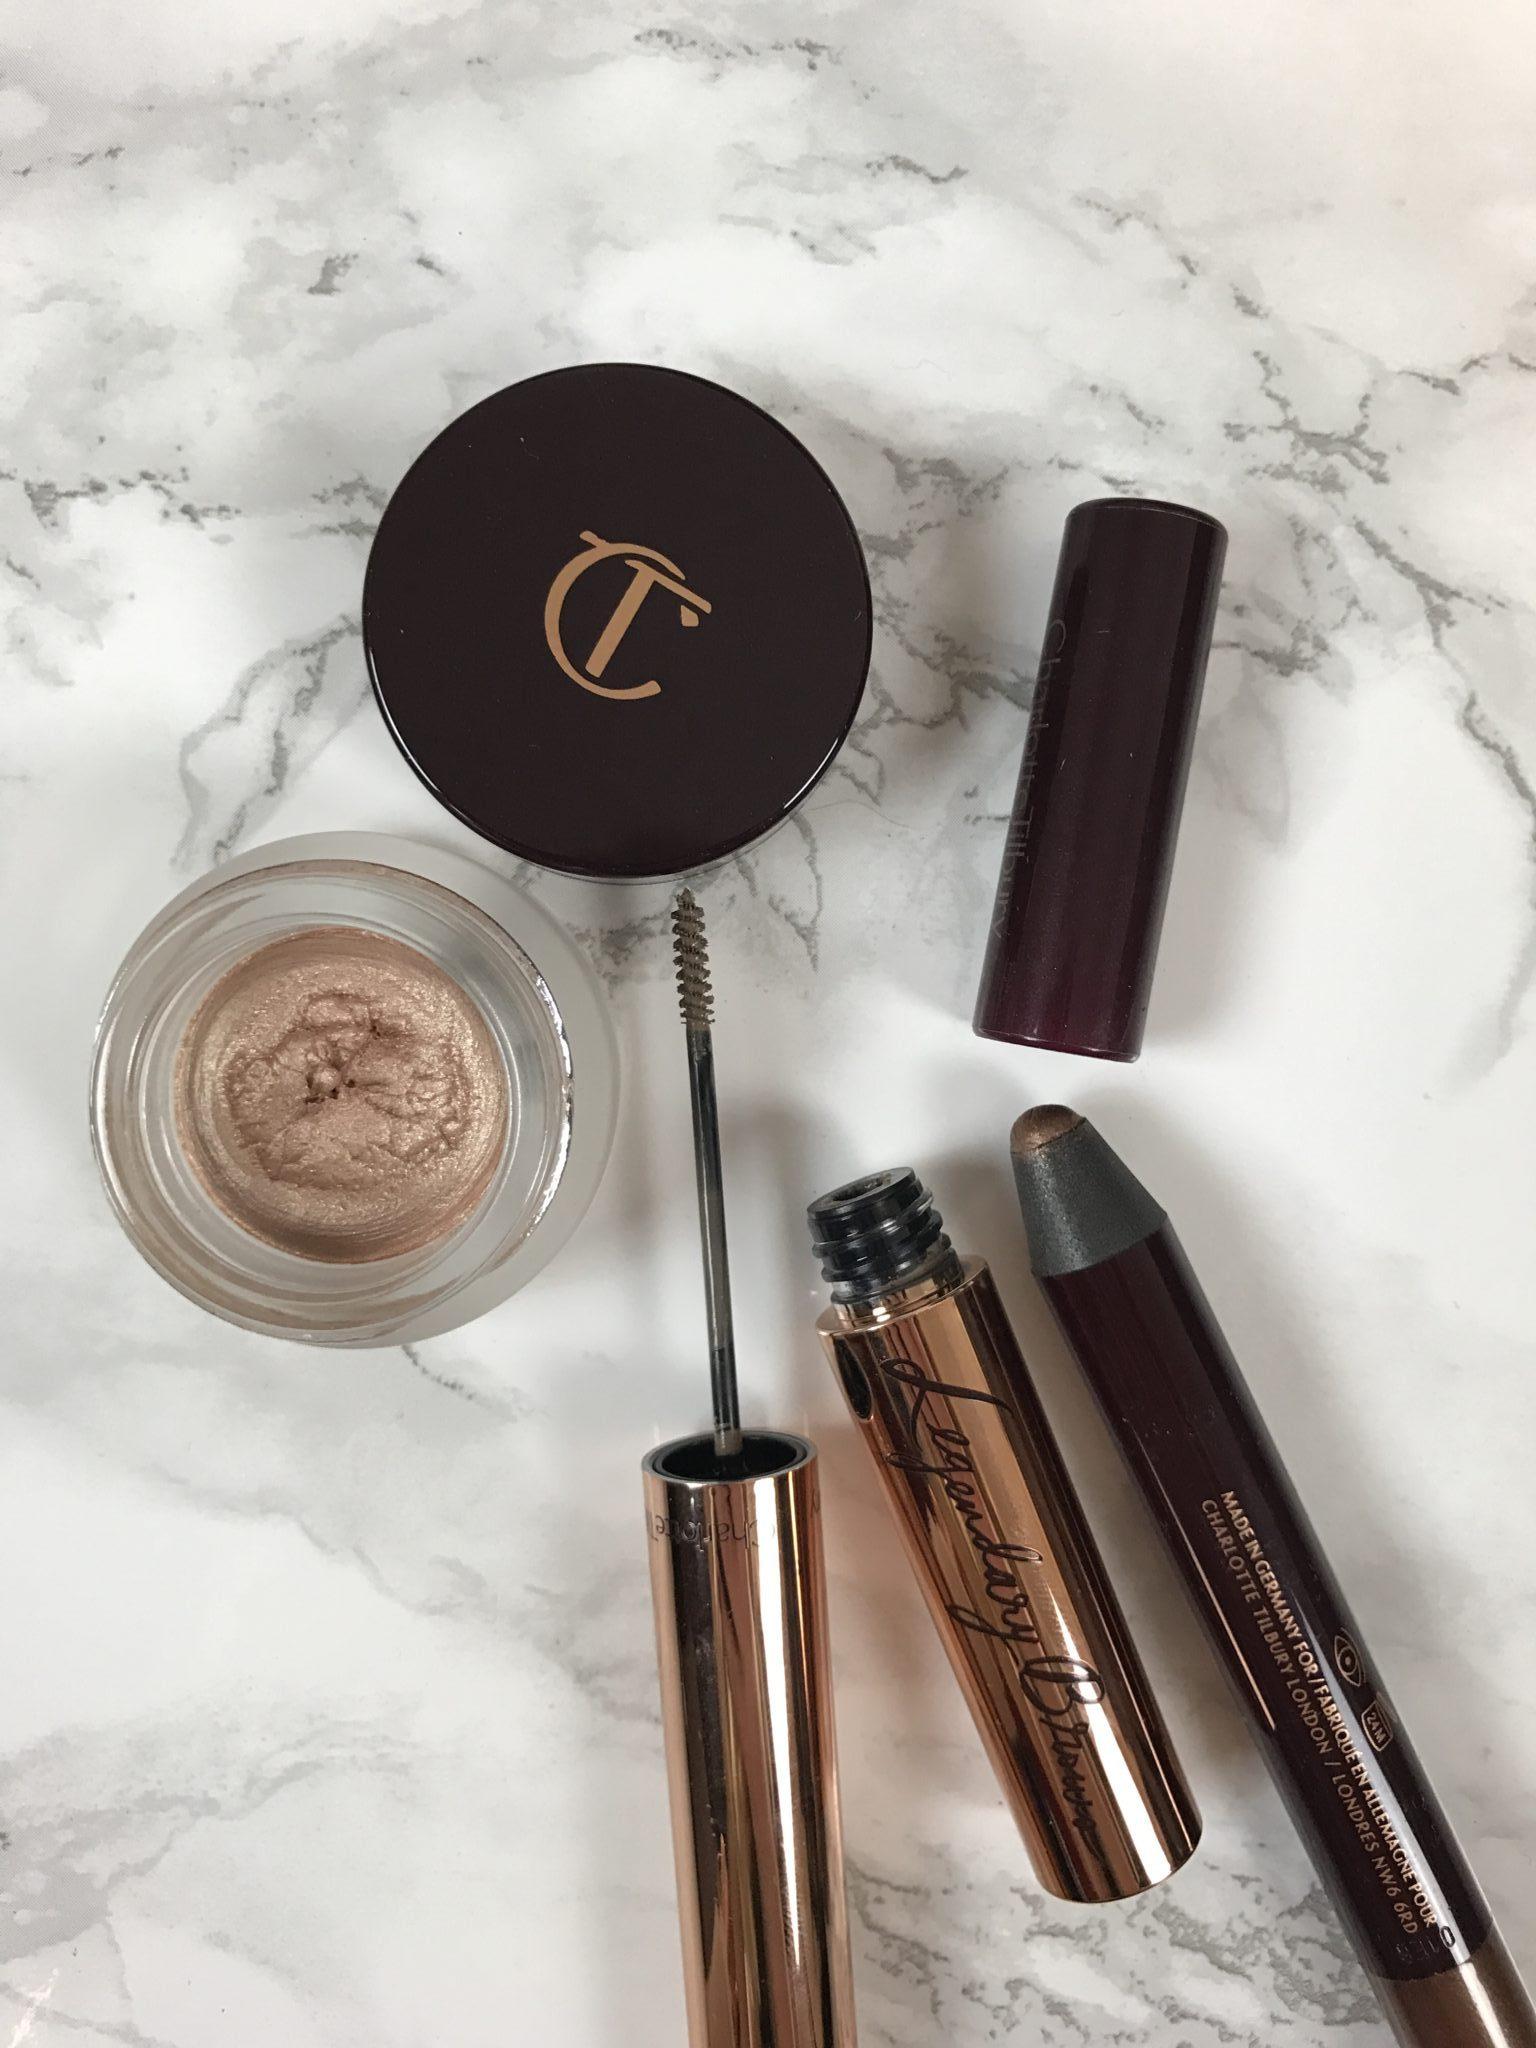 Charlotte Tilbury | Spring Makeup Refresh